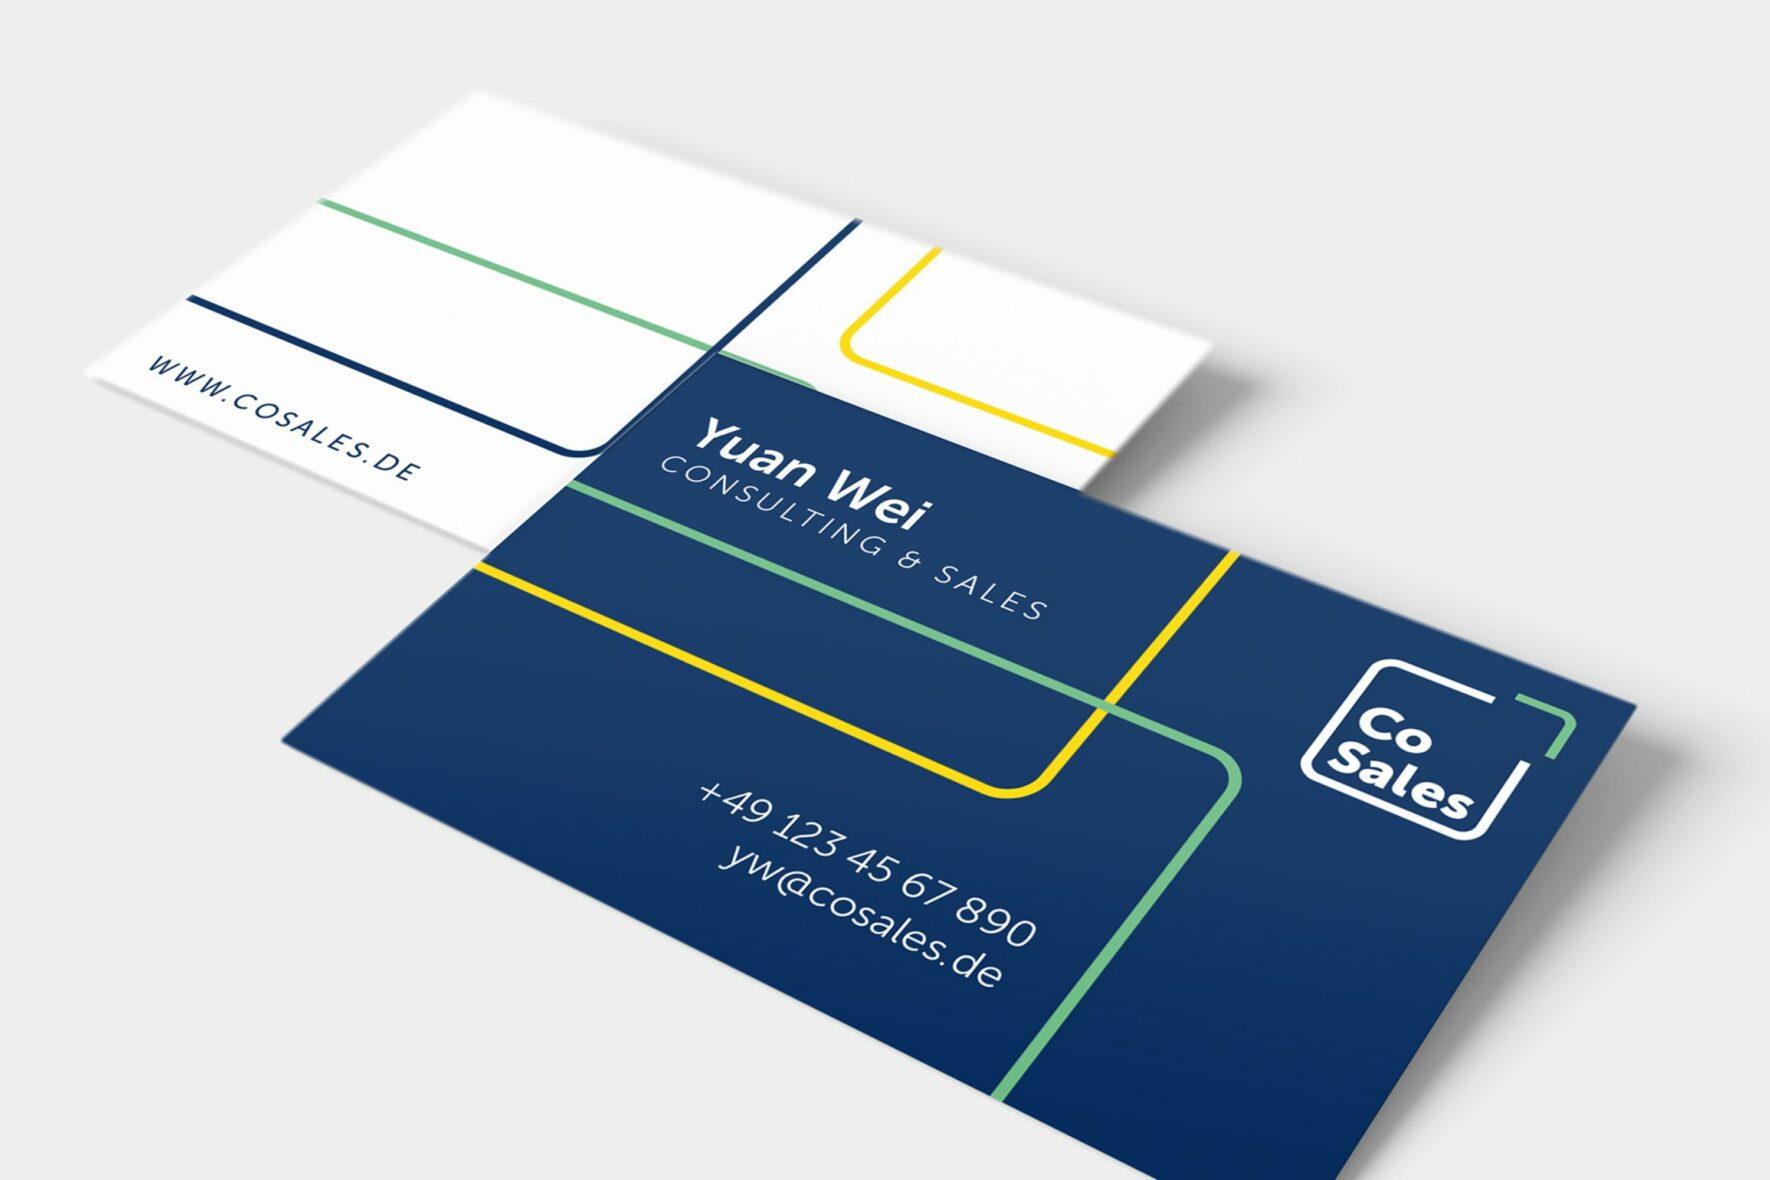 CoSales-Visitenkarten-Gestaltung-Corporate-Design-Print-FORMLOS-Berlin-5